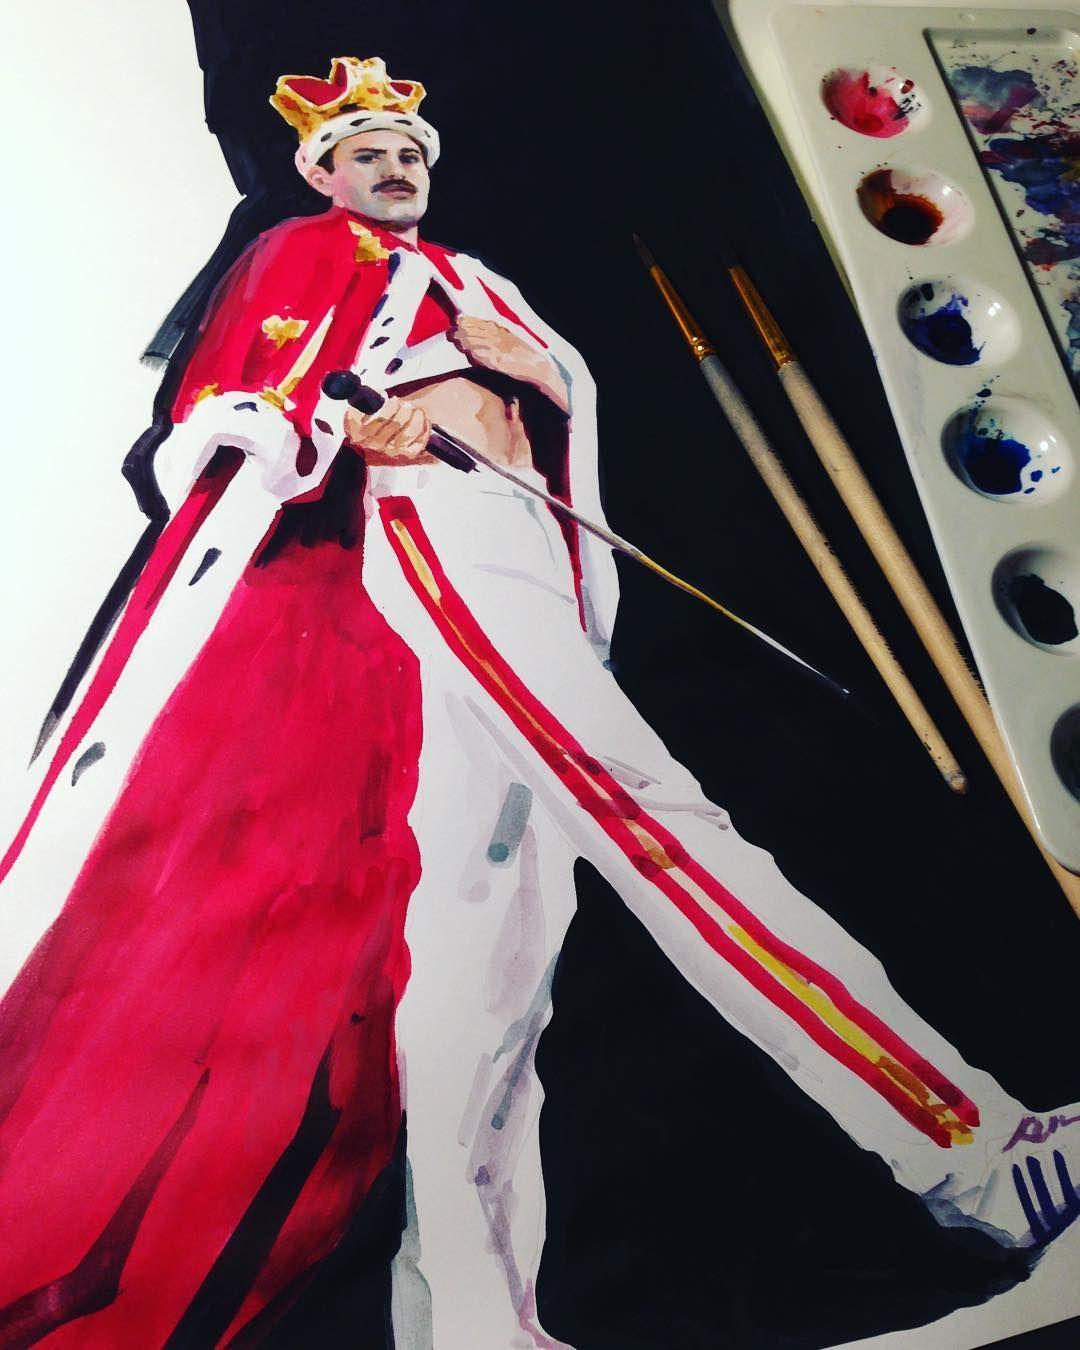 Stg Queen A Kind Of Magic Lp Record 1986 5099924053112 Ebay Queen Album Covers Queen Albums Iconic Album Covers